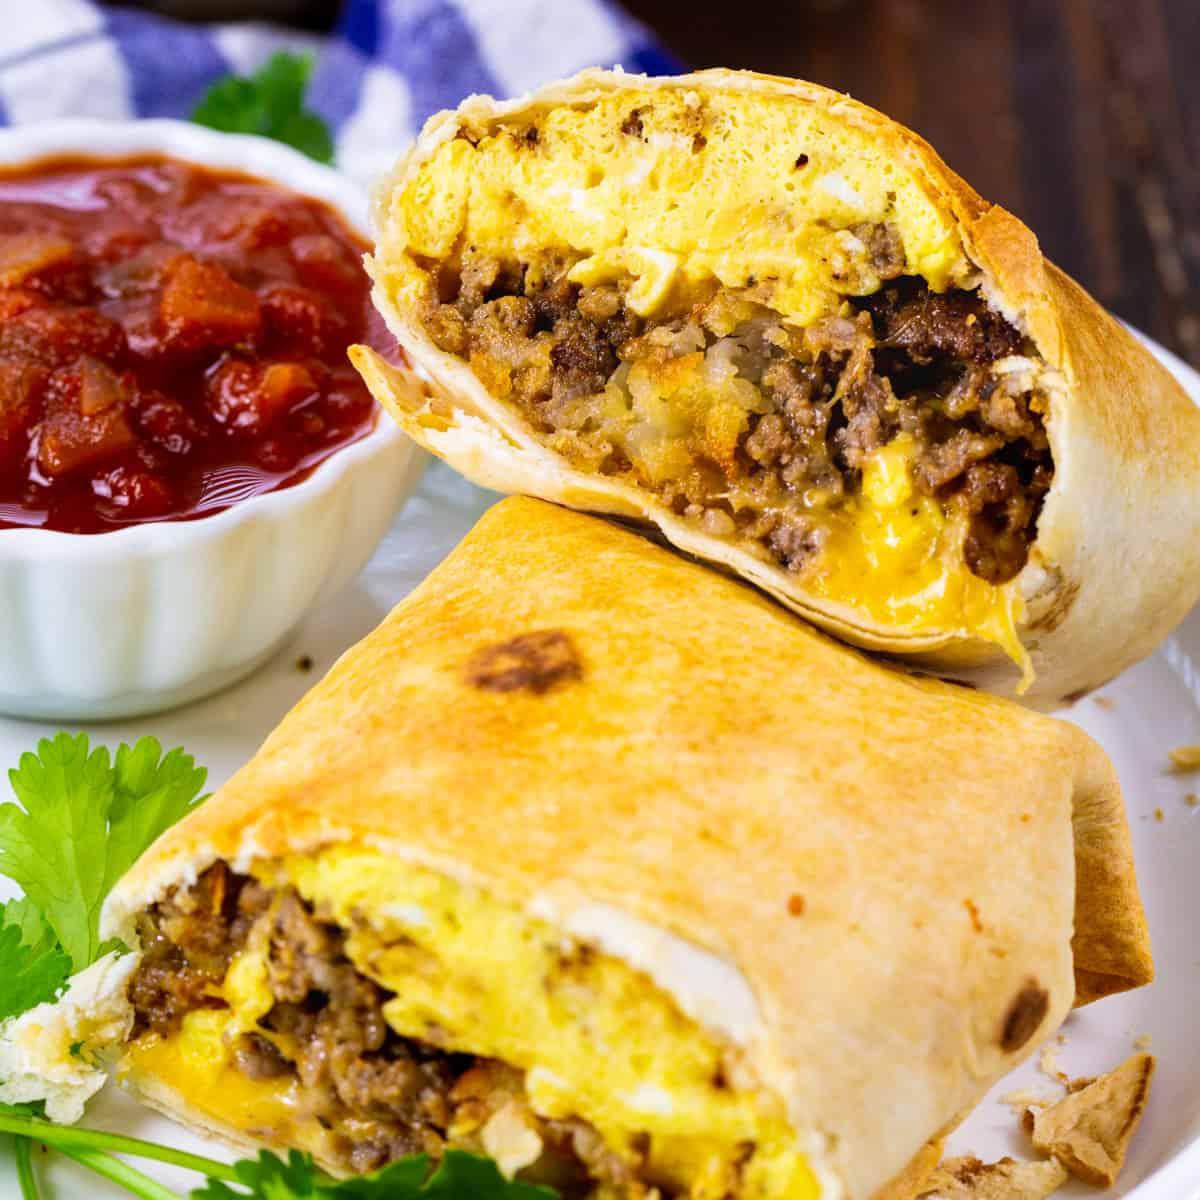 Air Fryer Breakfast Burrito with Sausage cut in half.